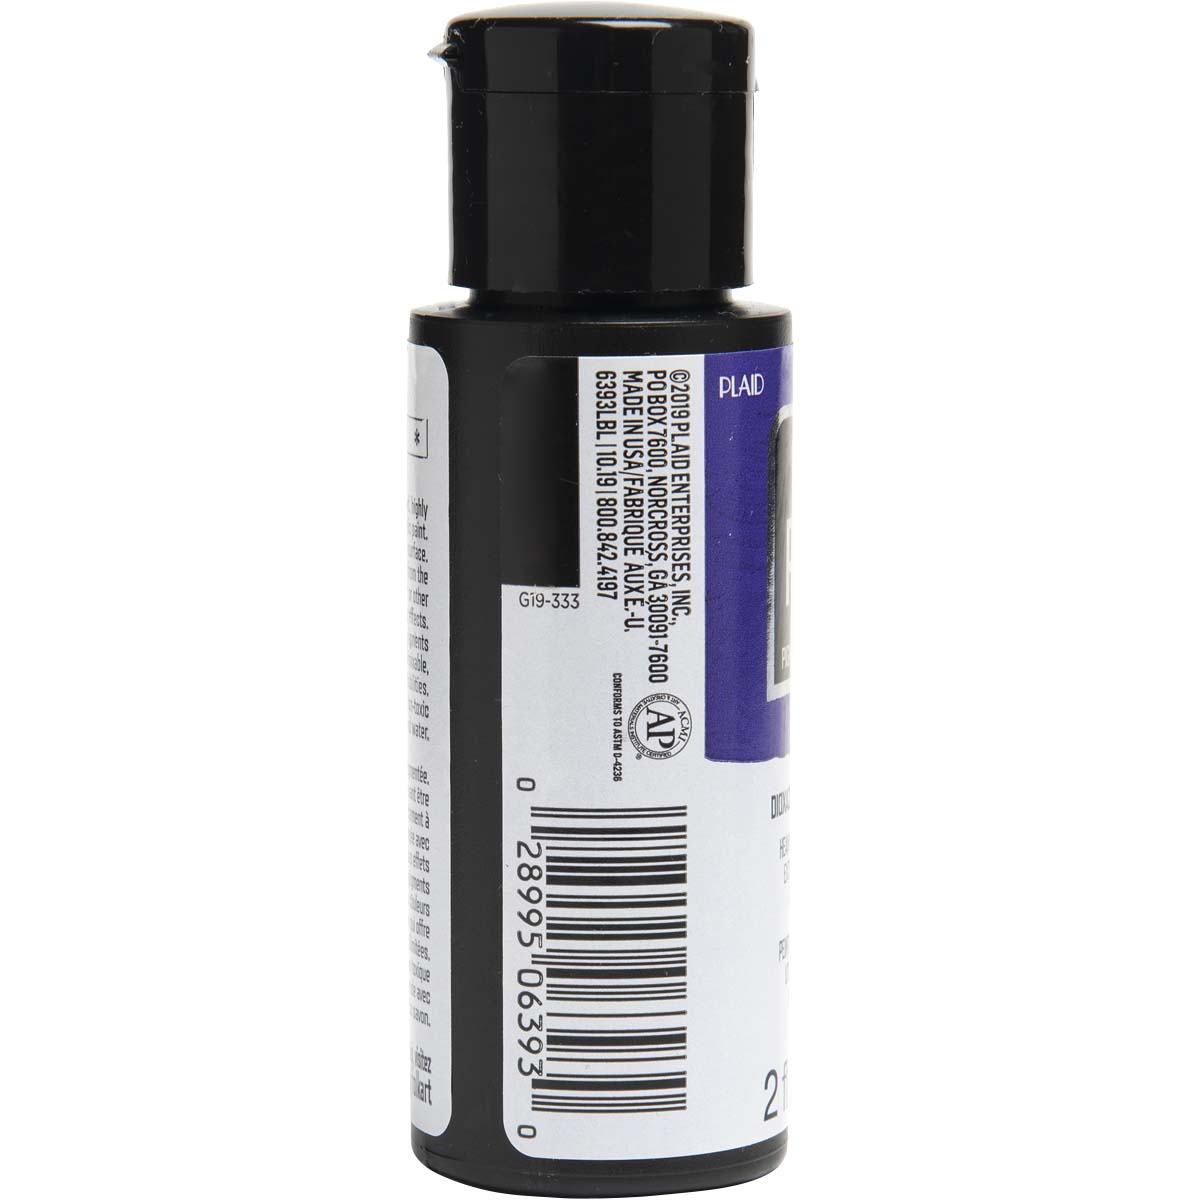 FolkArt ® Pure™ Artist Pigment - Dioxazine Purple, 2 oz. - 6393